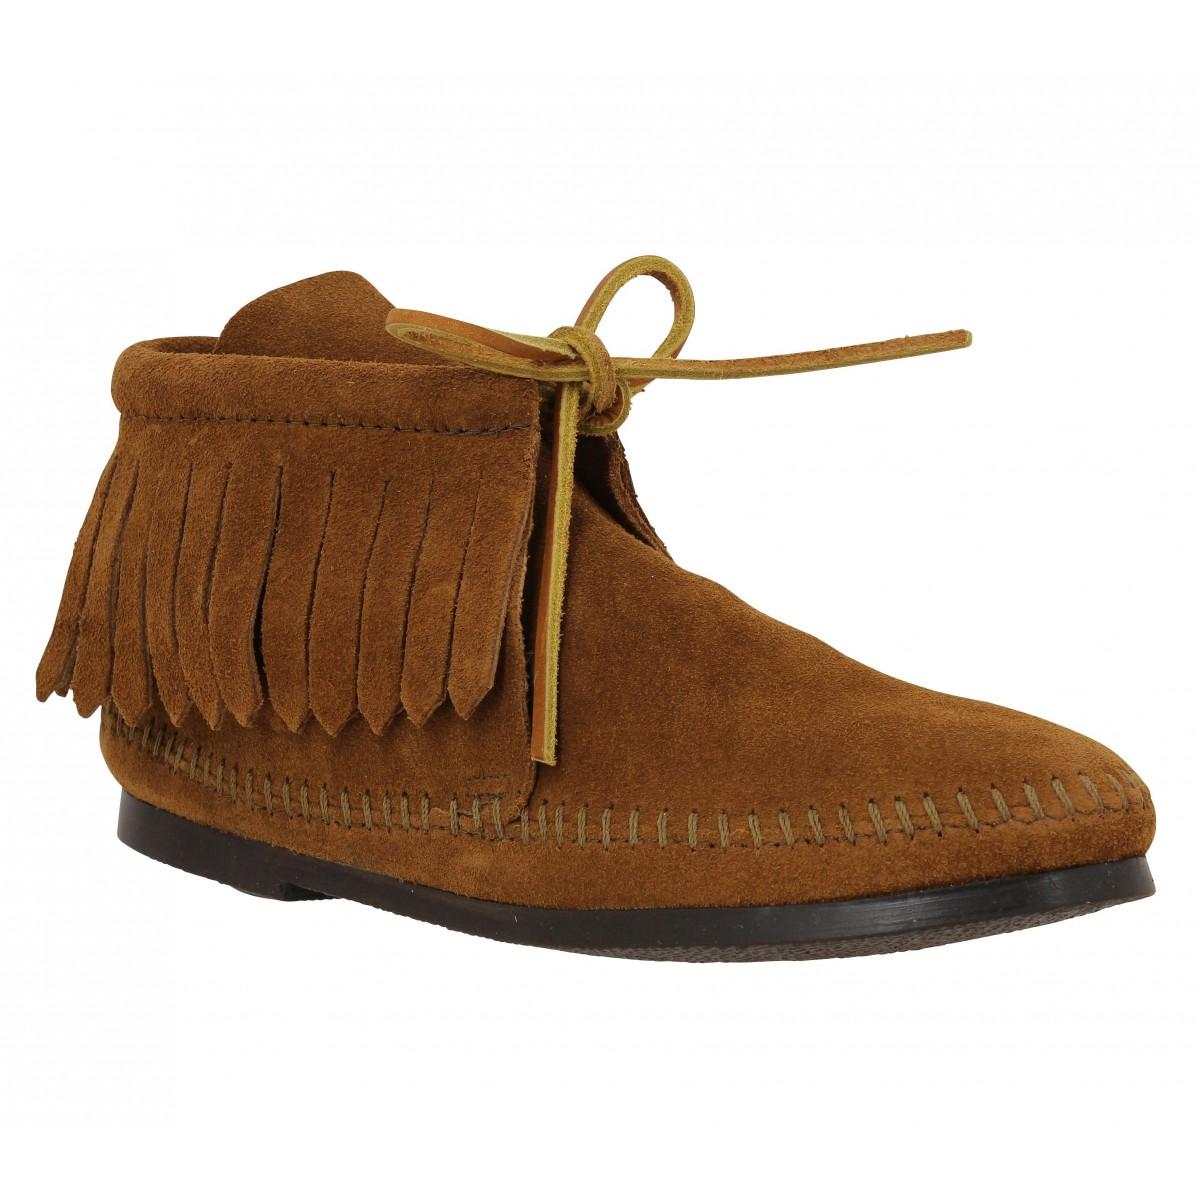 Minnetonka Femme Classic Fringe Boot...